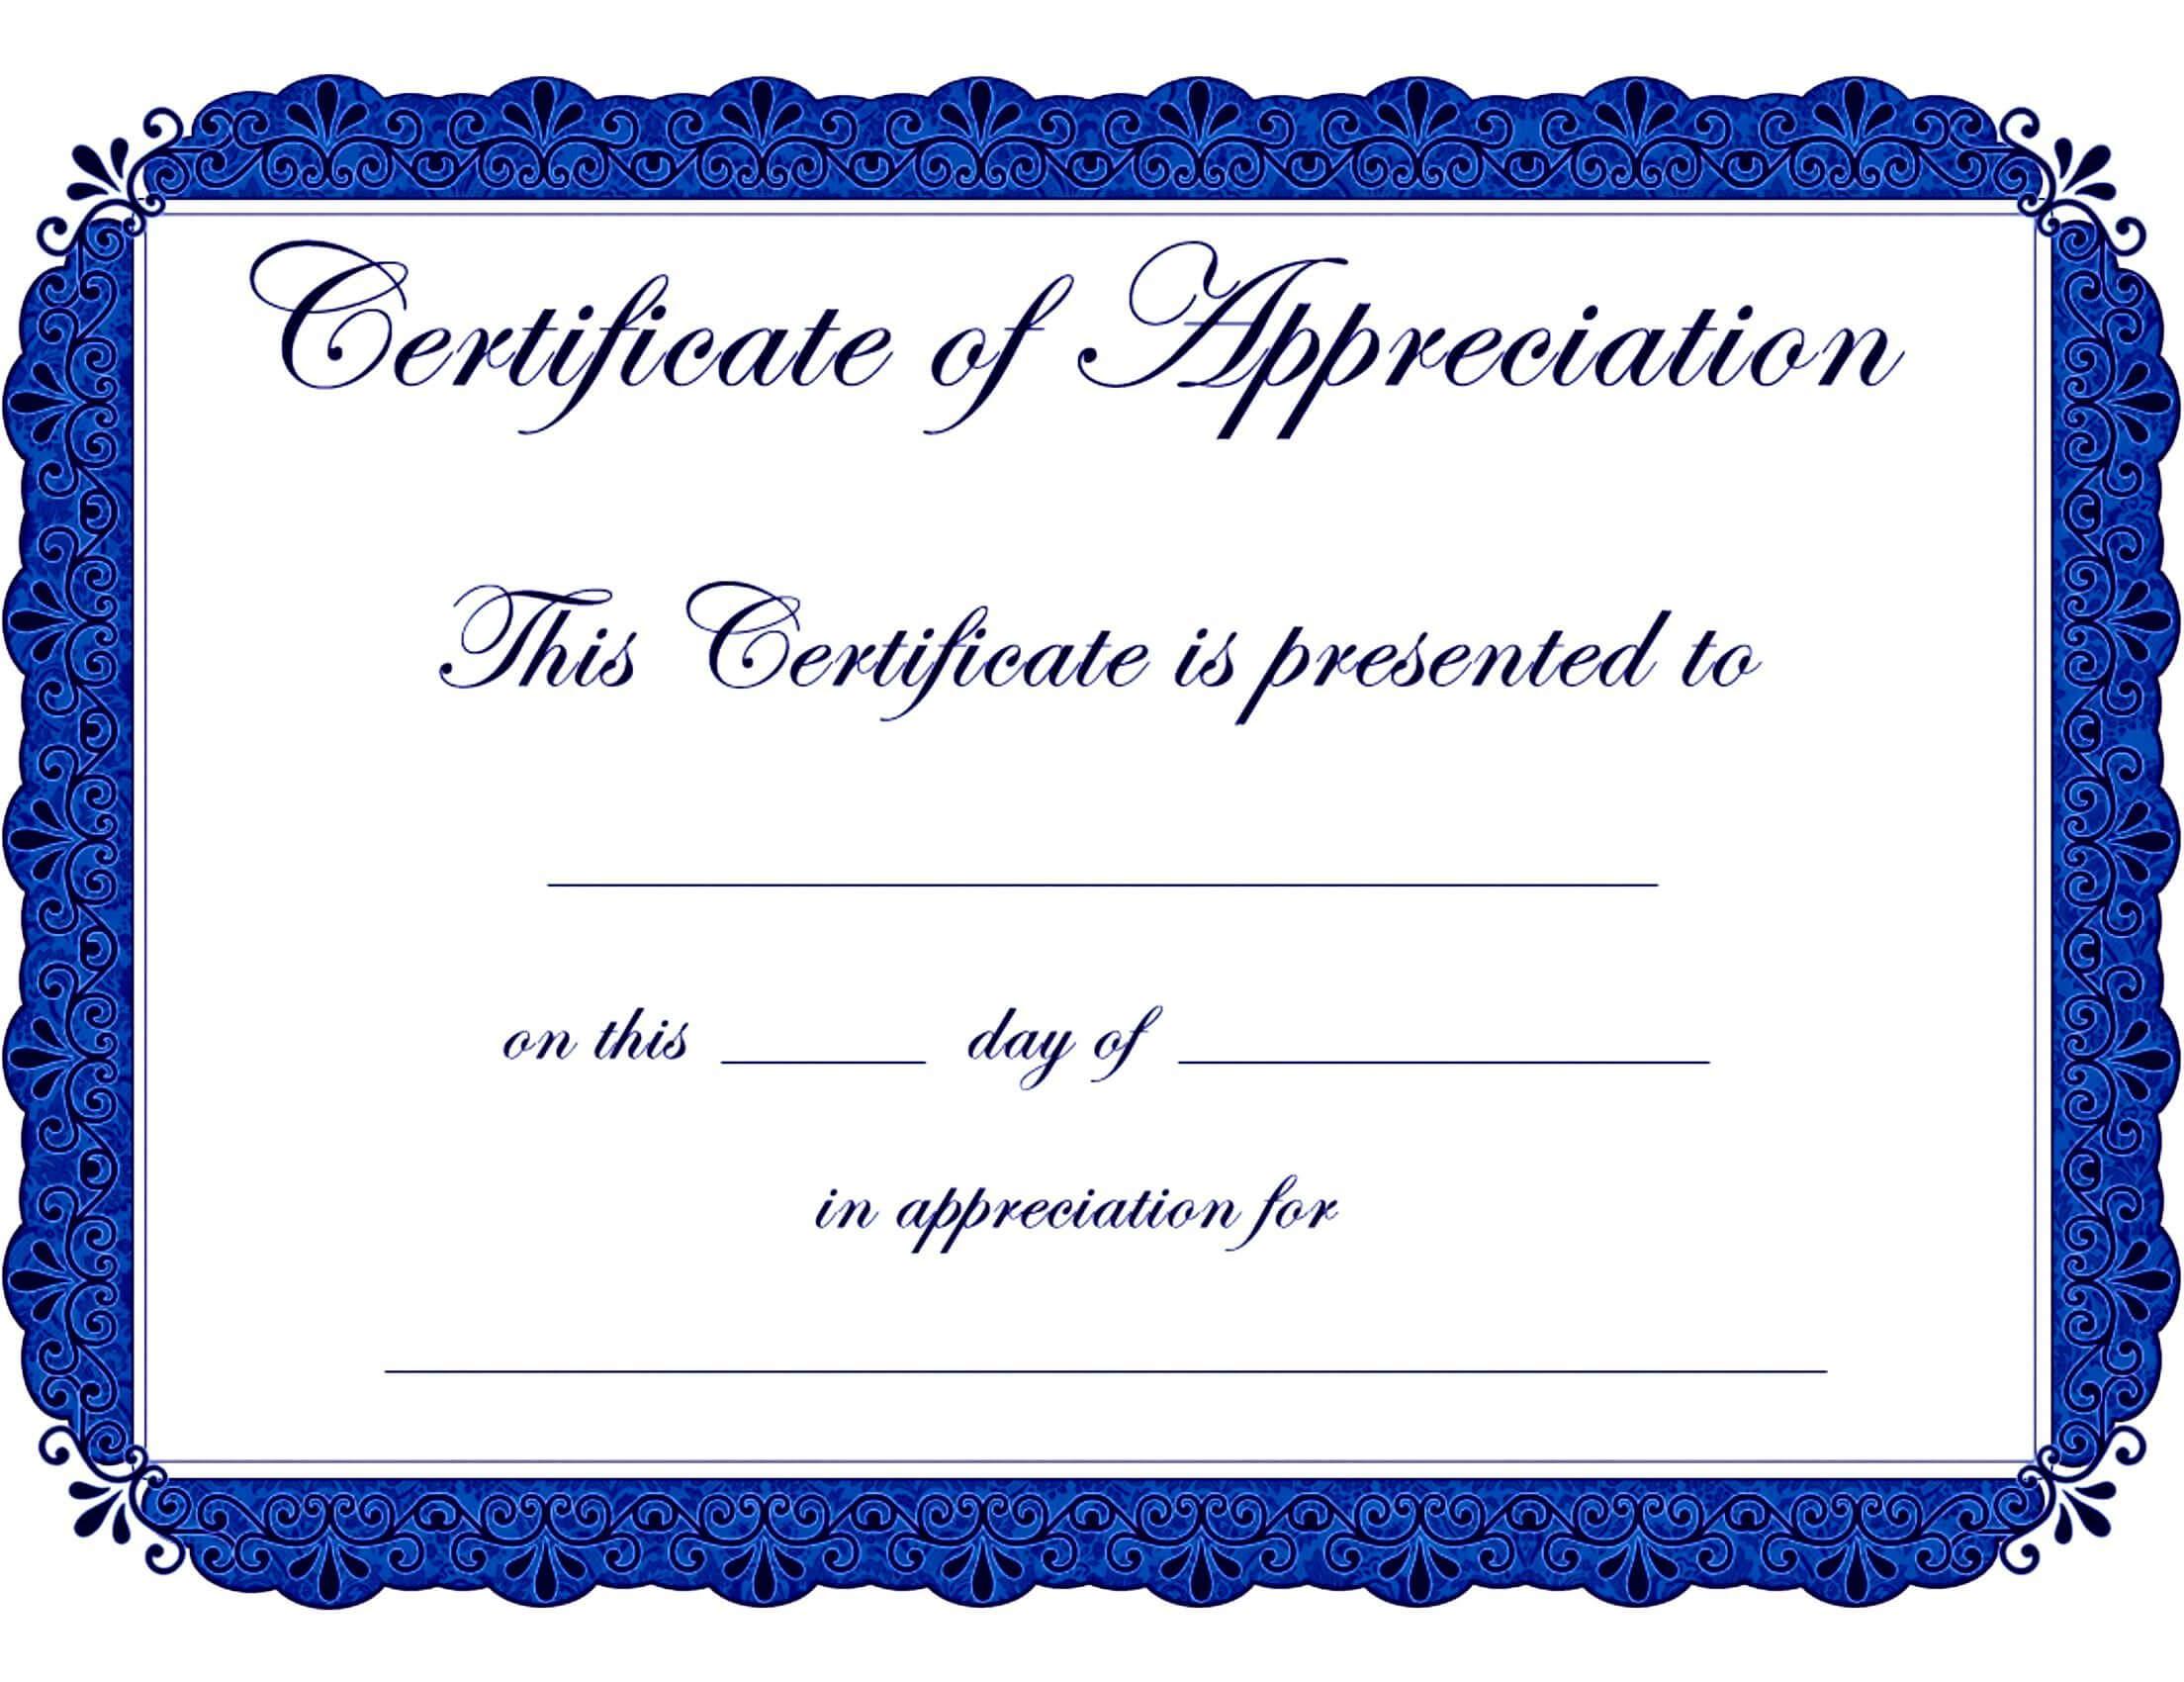 010 Microsoft Word Certificate Template Ideas Award Ceremony Regarding Sports Day Certificate Templates Free